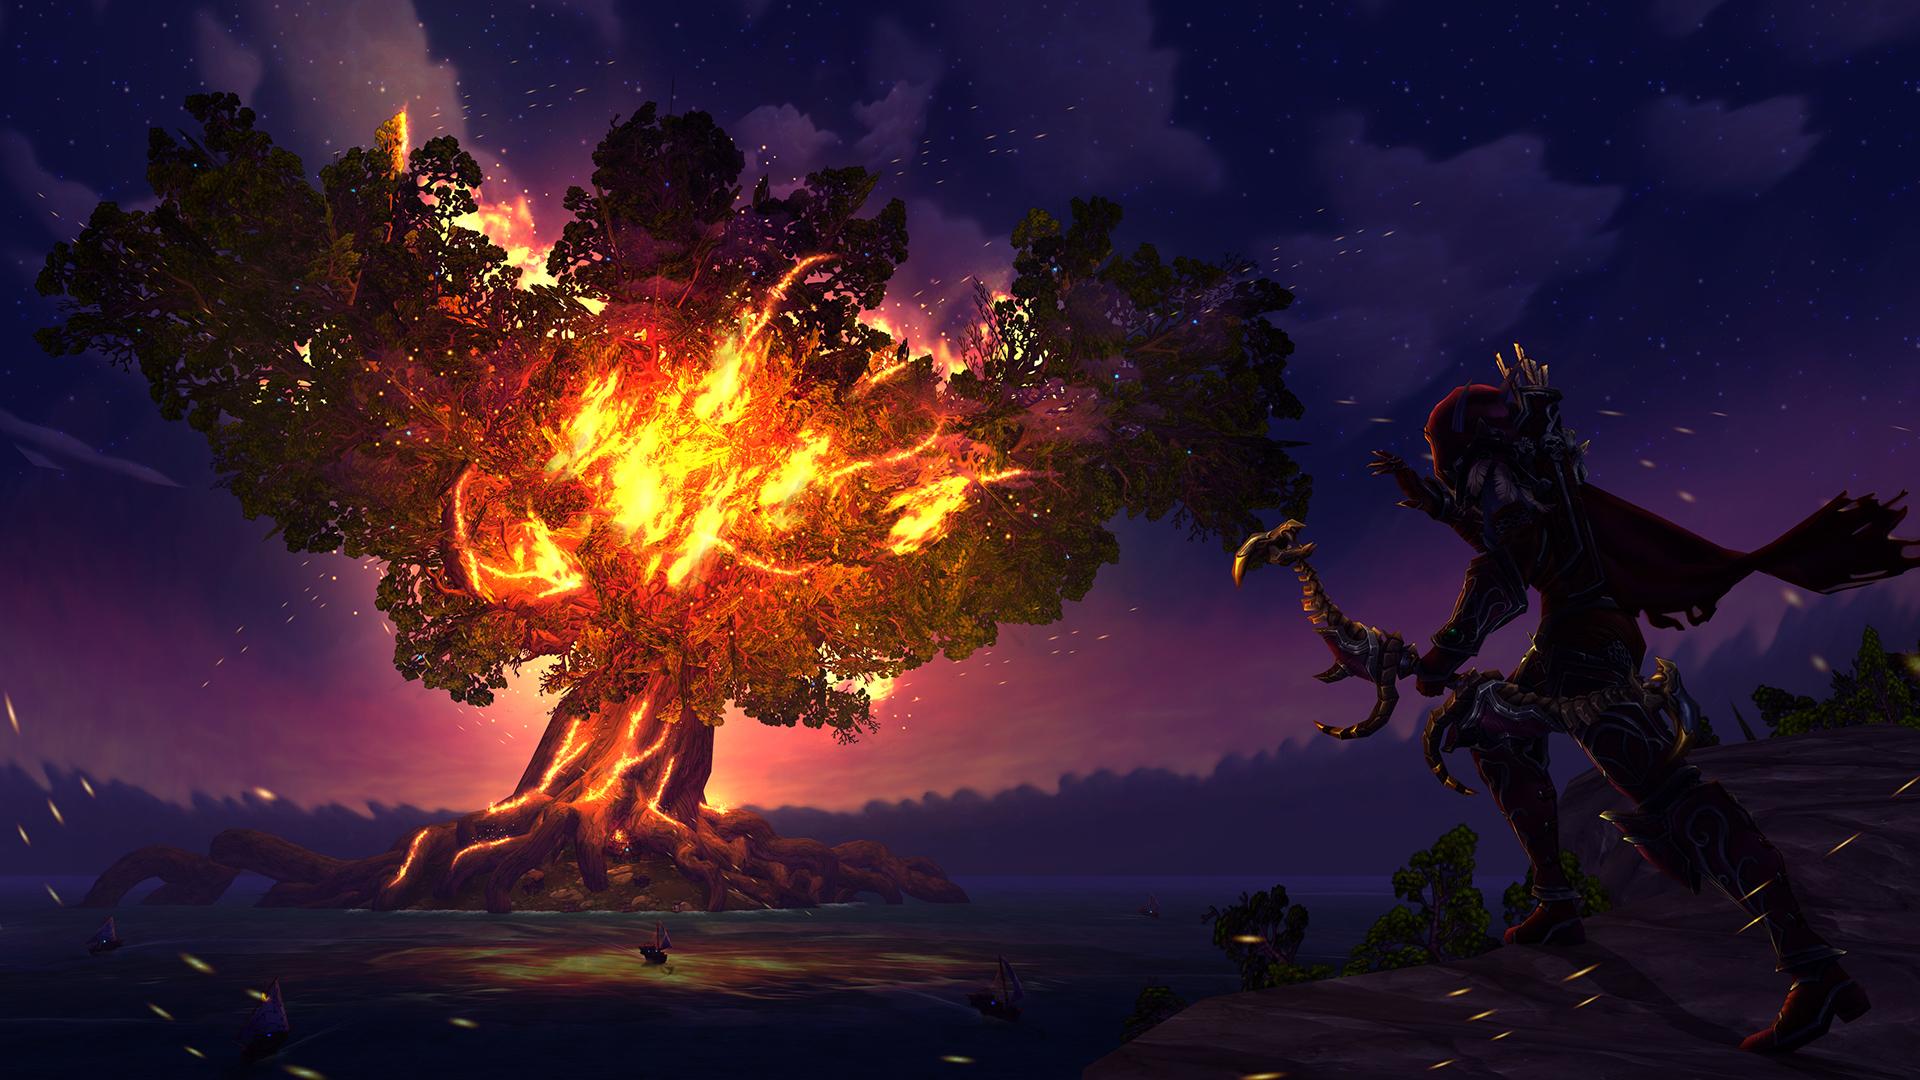 Sylvanas Windrunner Fire Tree World Of Warcraft Wallpaper